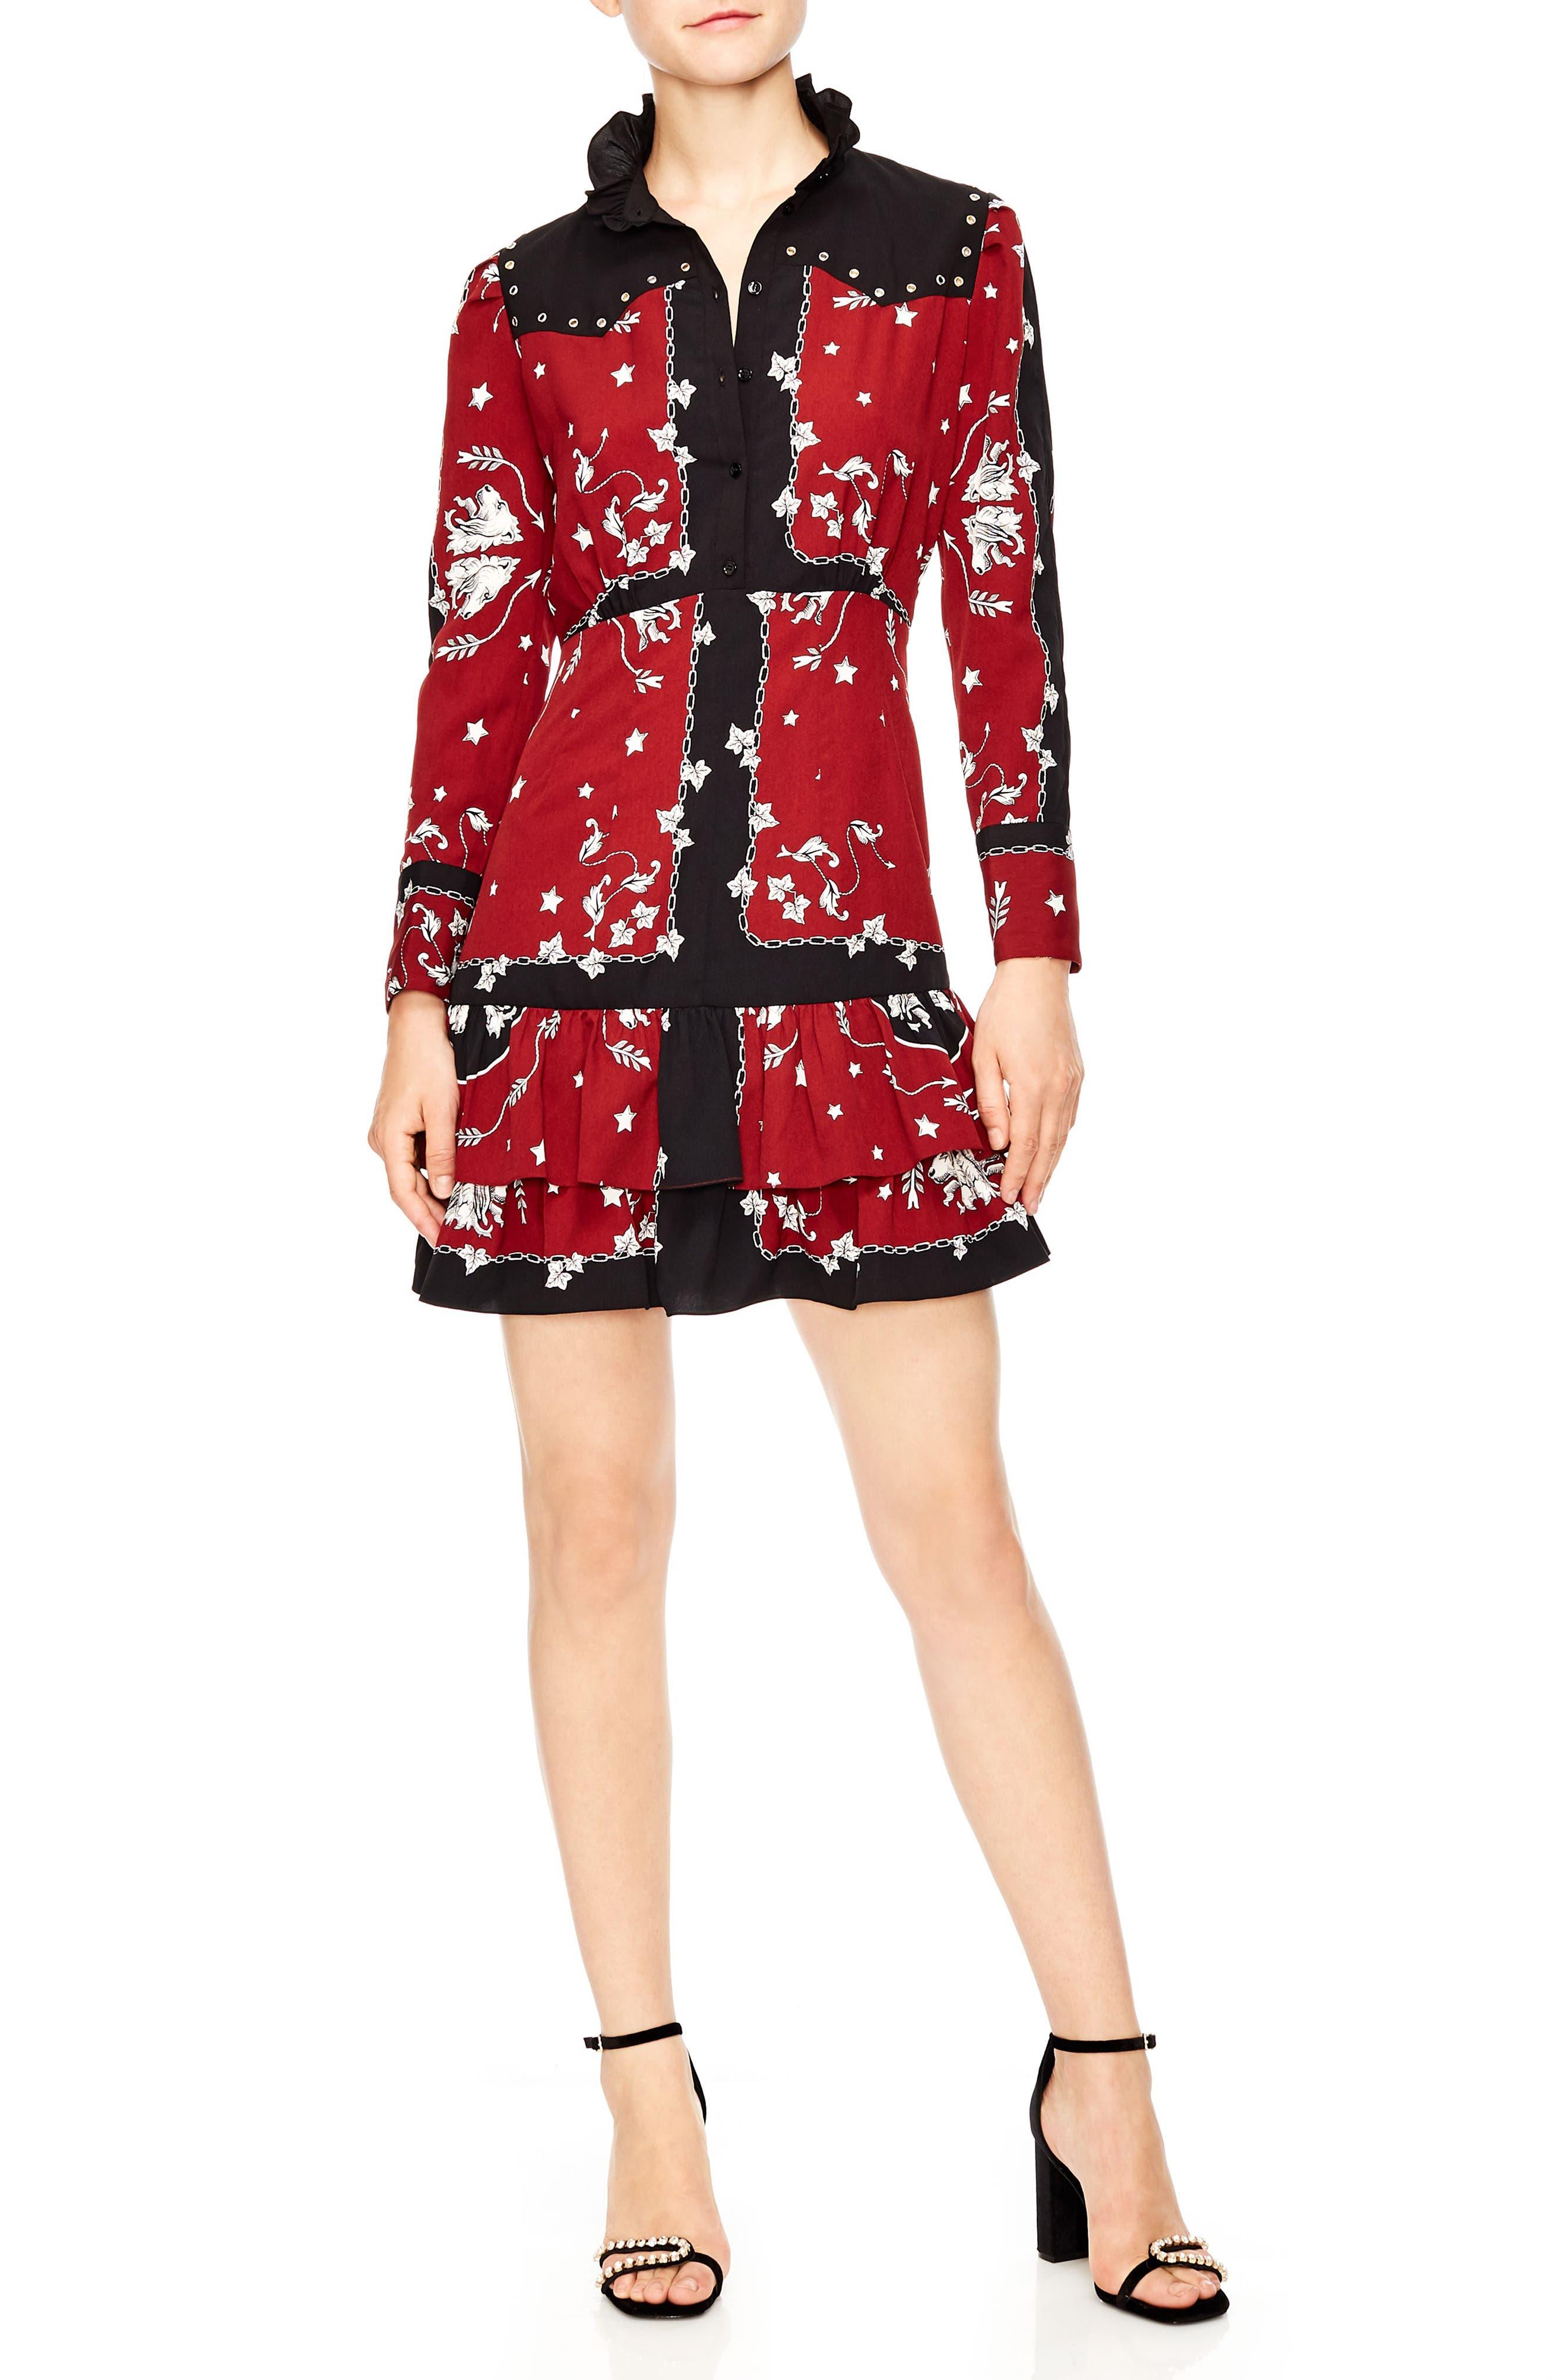 Grommet Detail Mini Dress,                             Main thumbnail 1, color,                             BURGUNDY